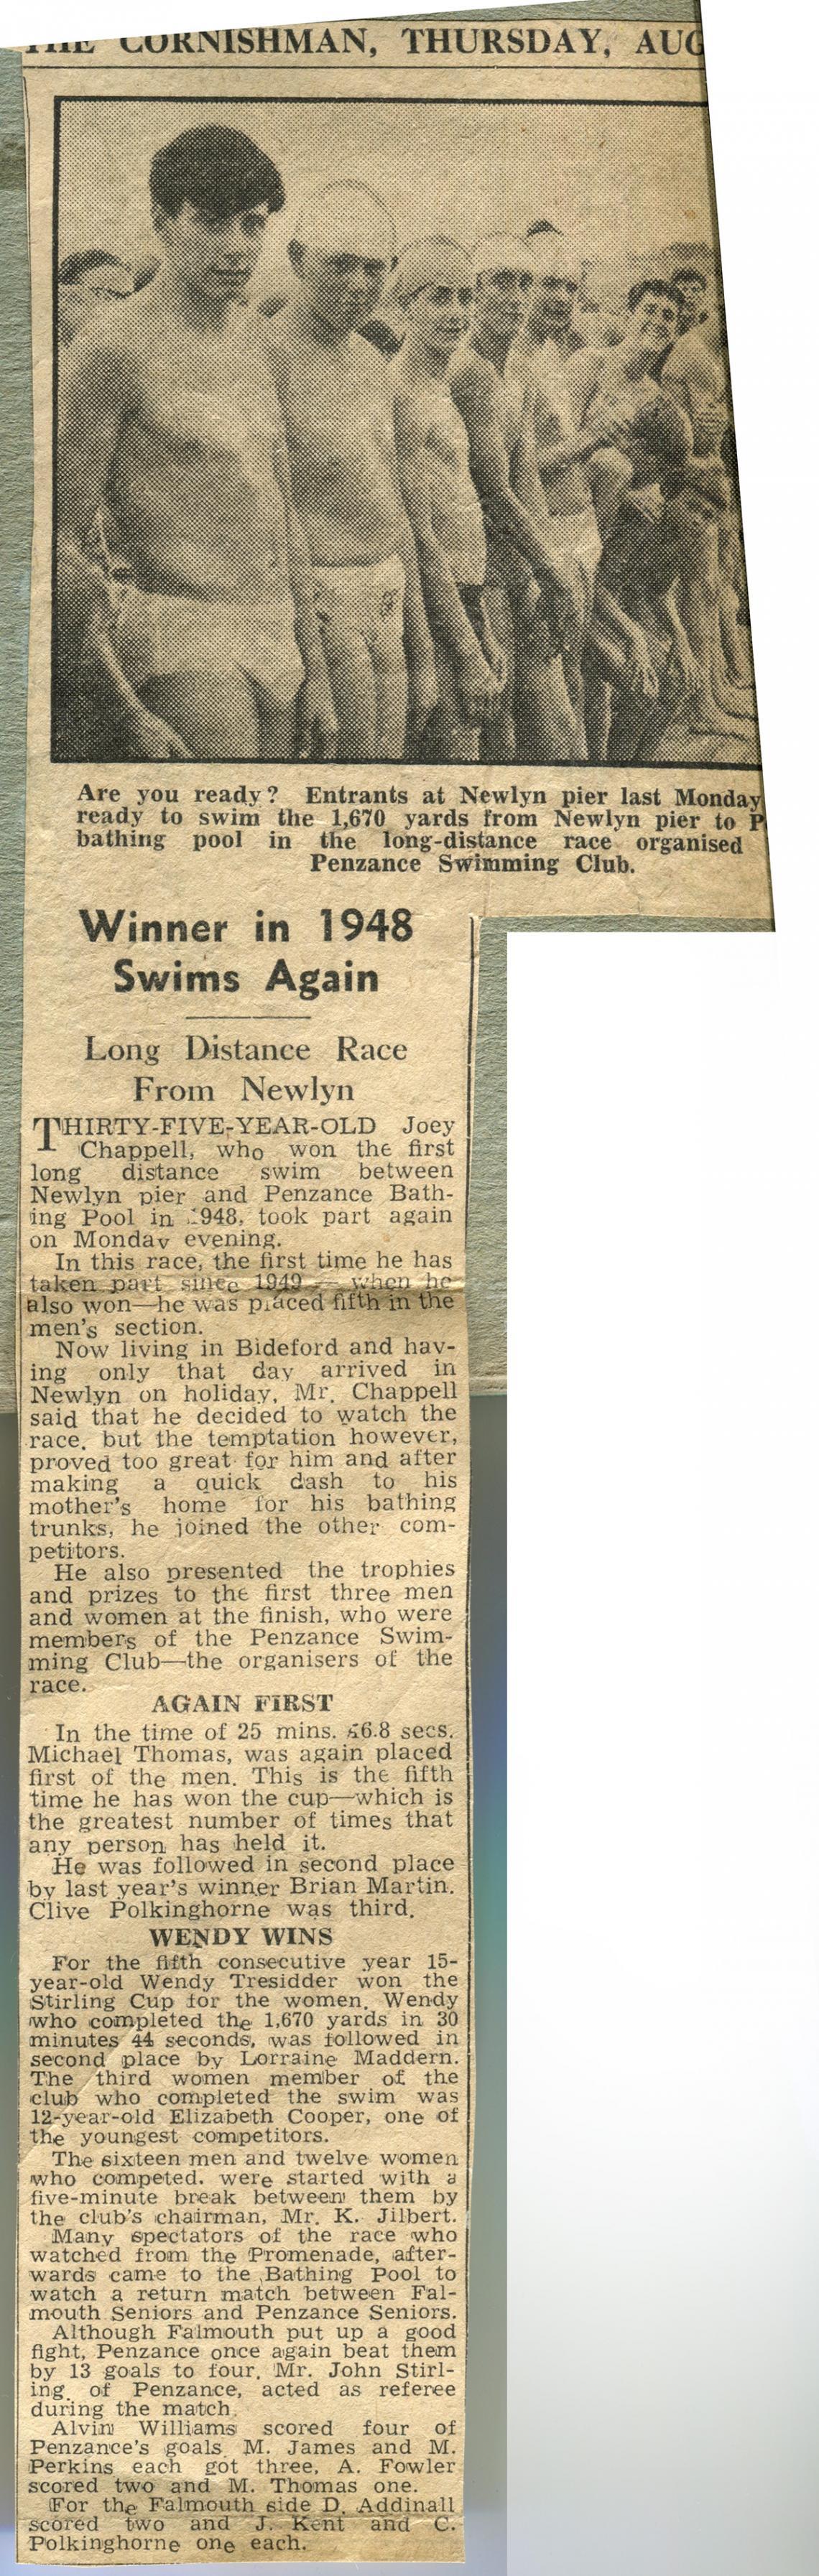 The Cornishman - Winner in 1948 Swims Again